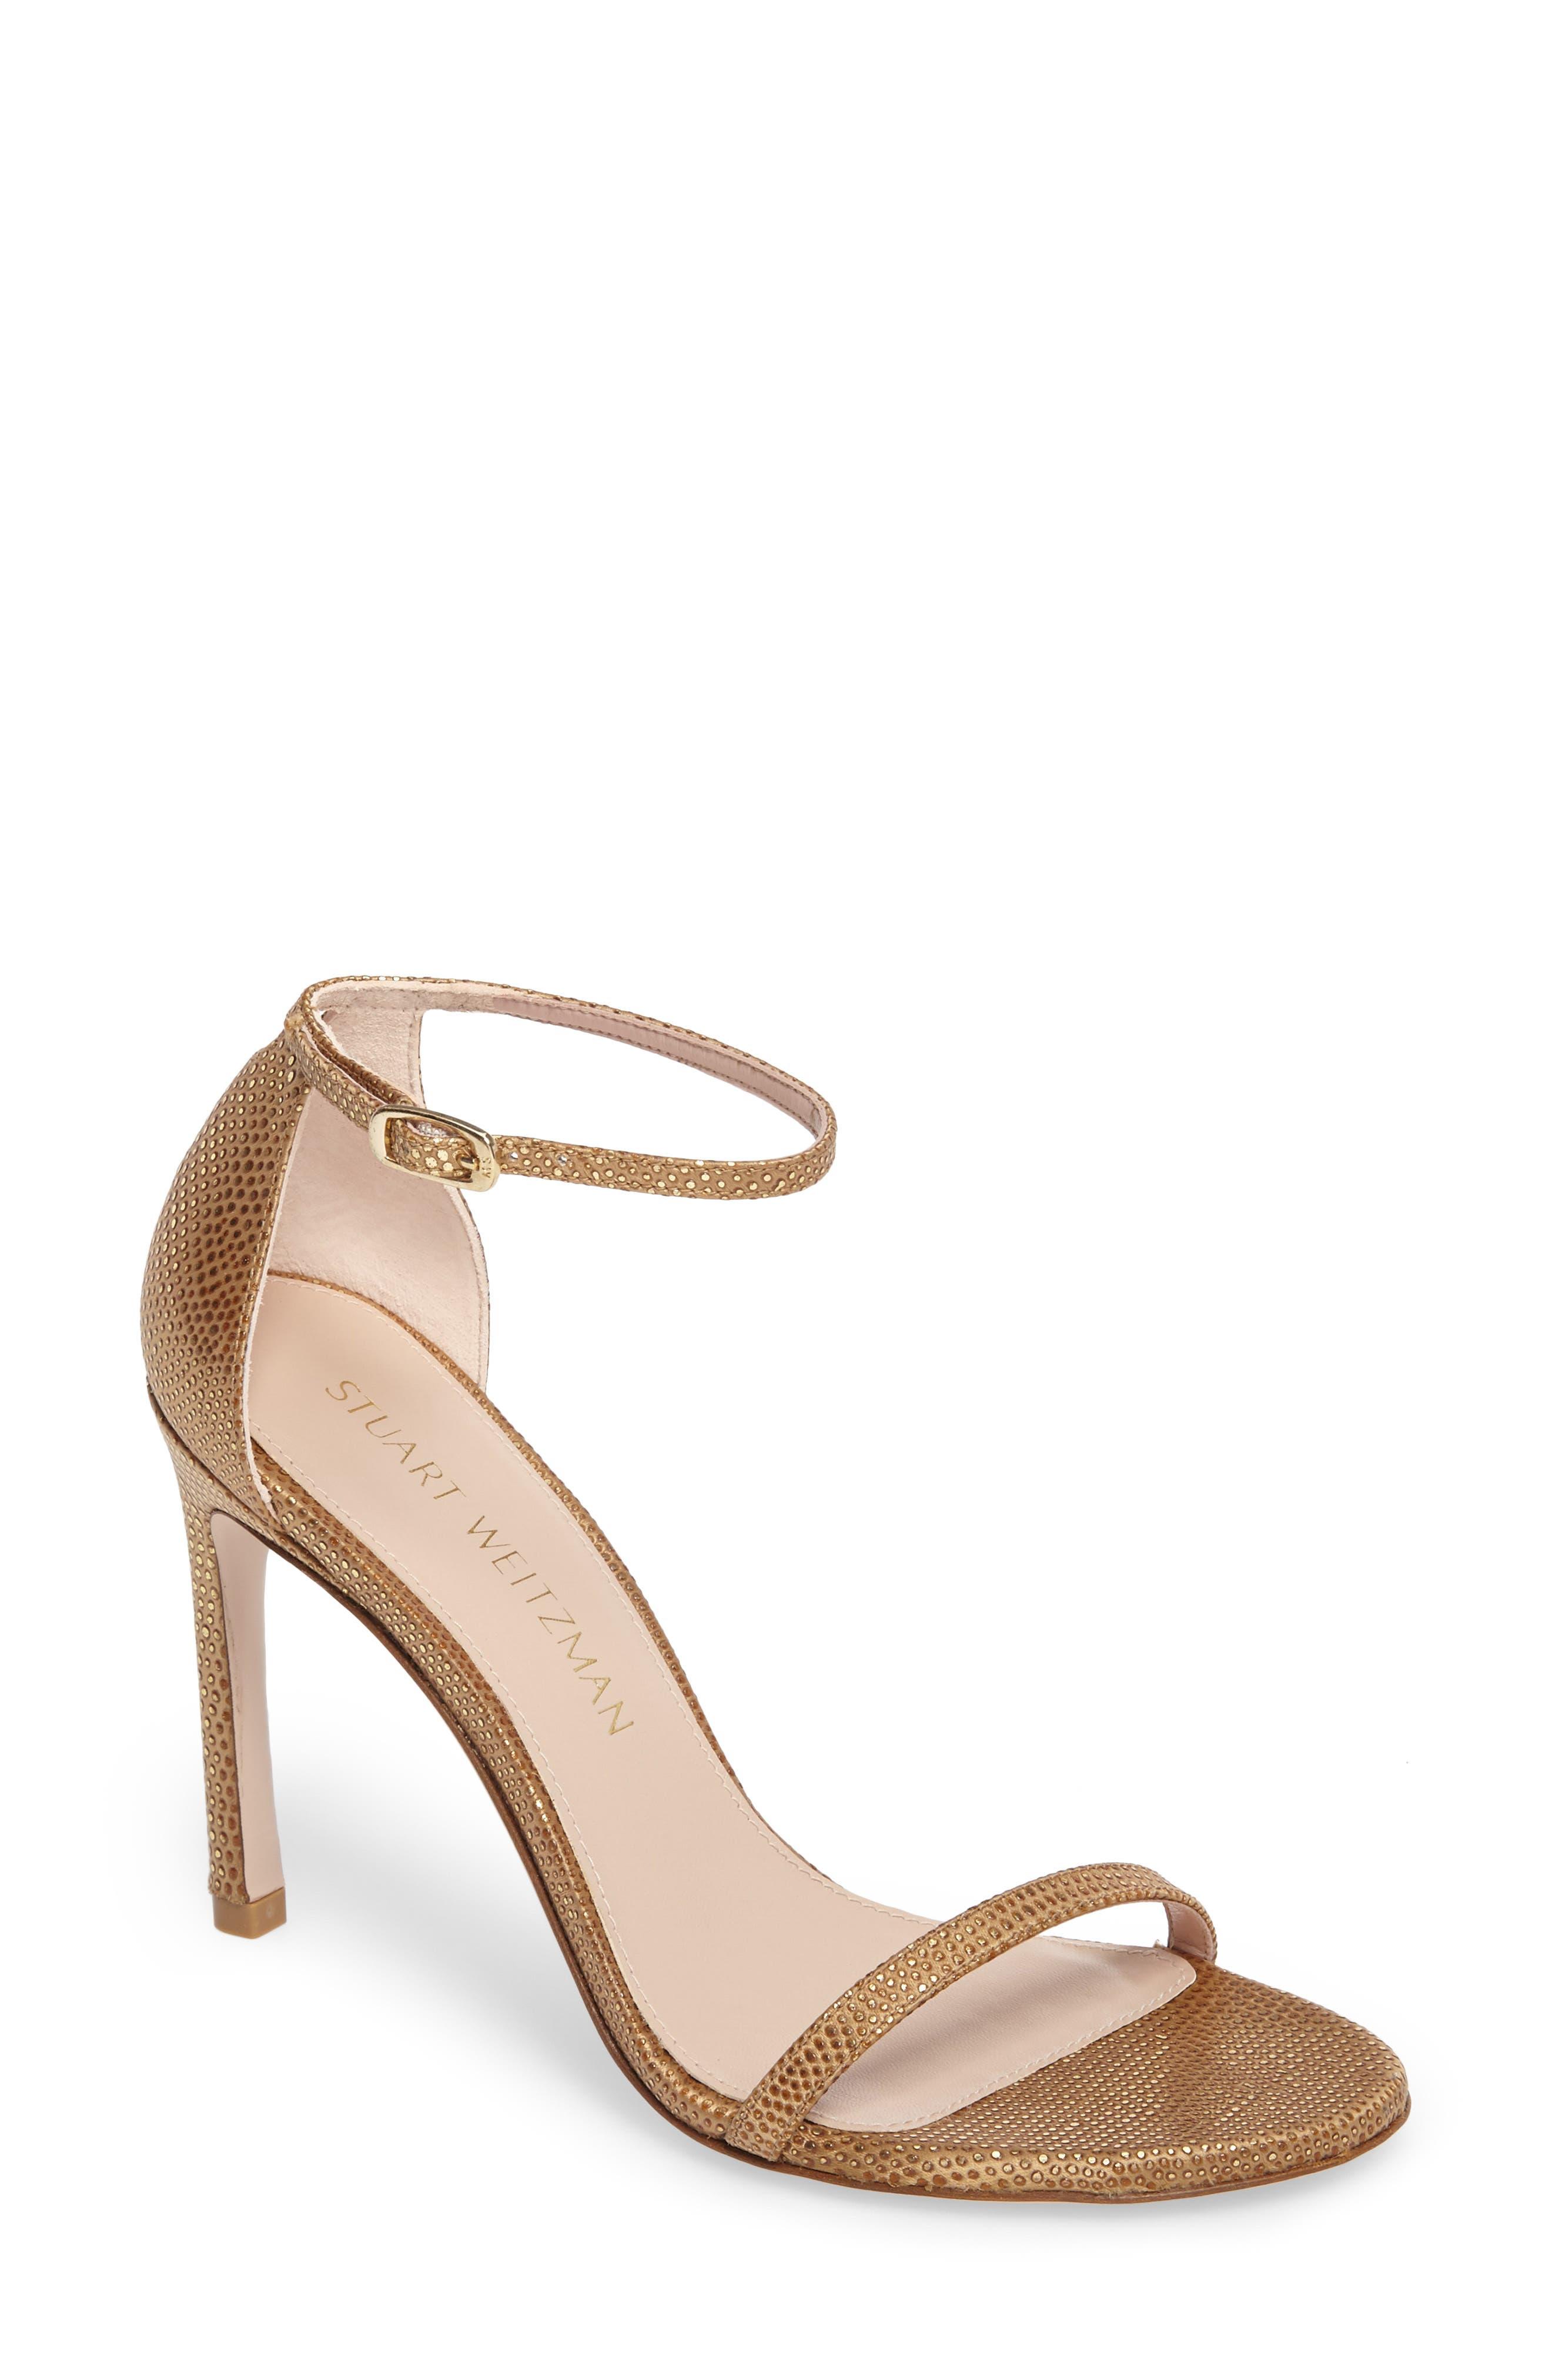 Nudistsong Ankle Strap Sandal,                             Main thumbnail 1, color,                             Gold Dot